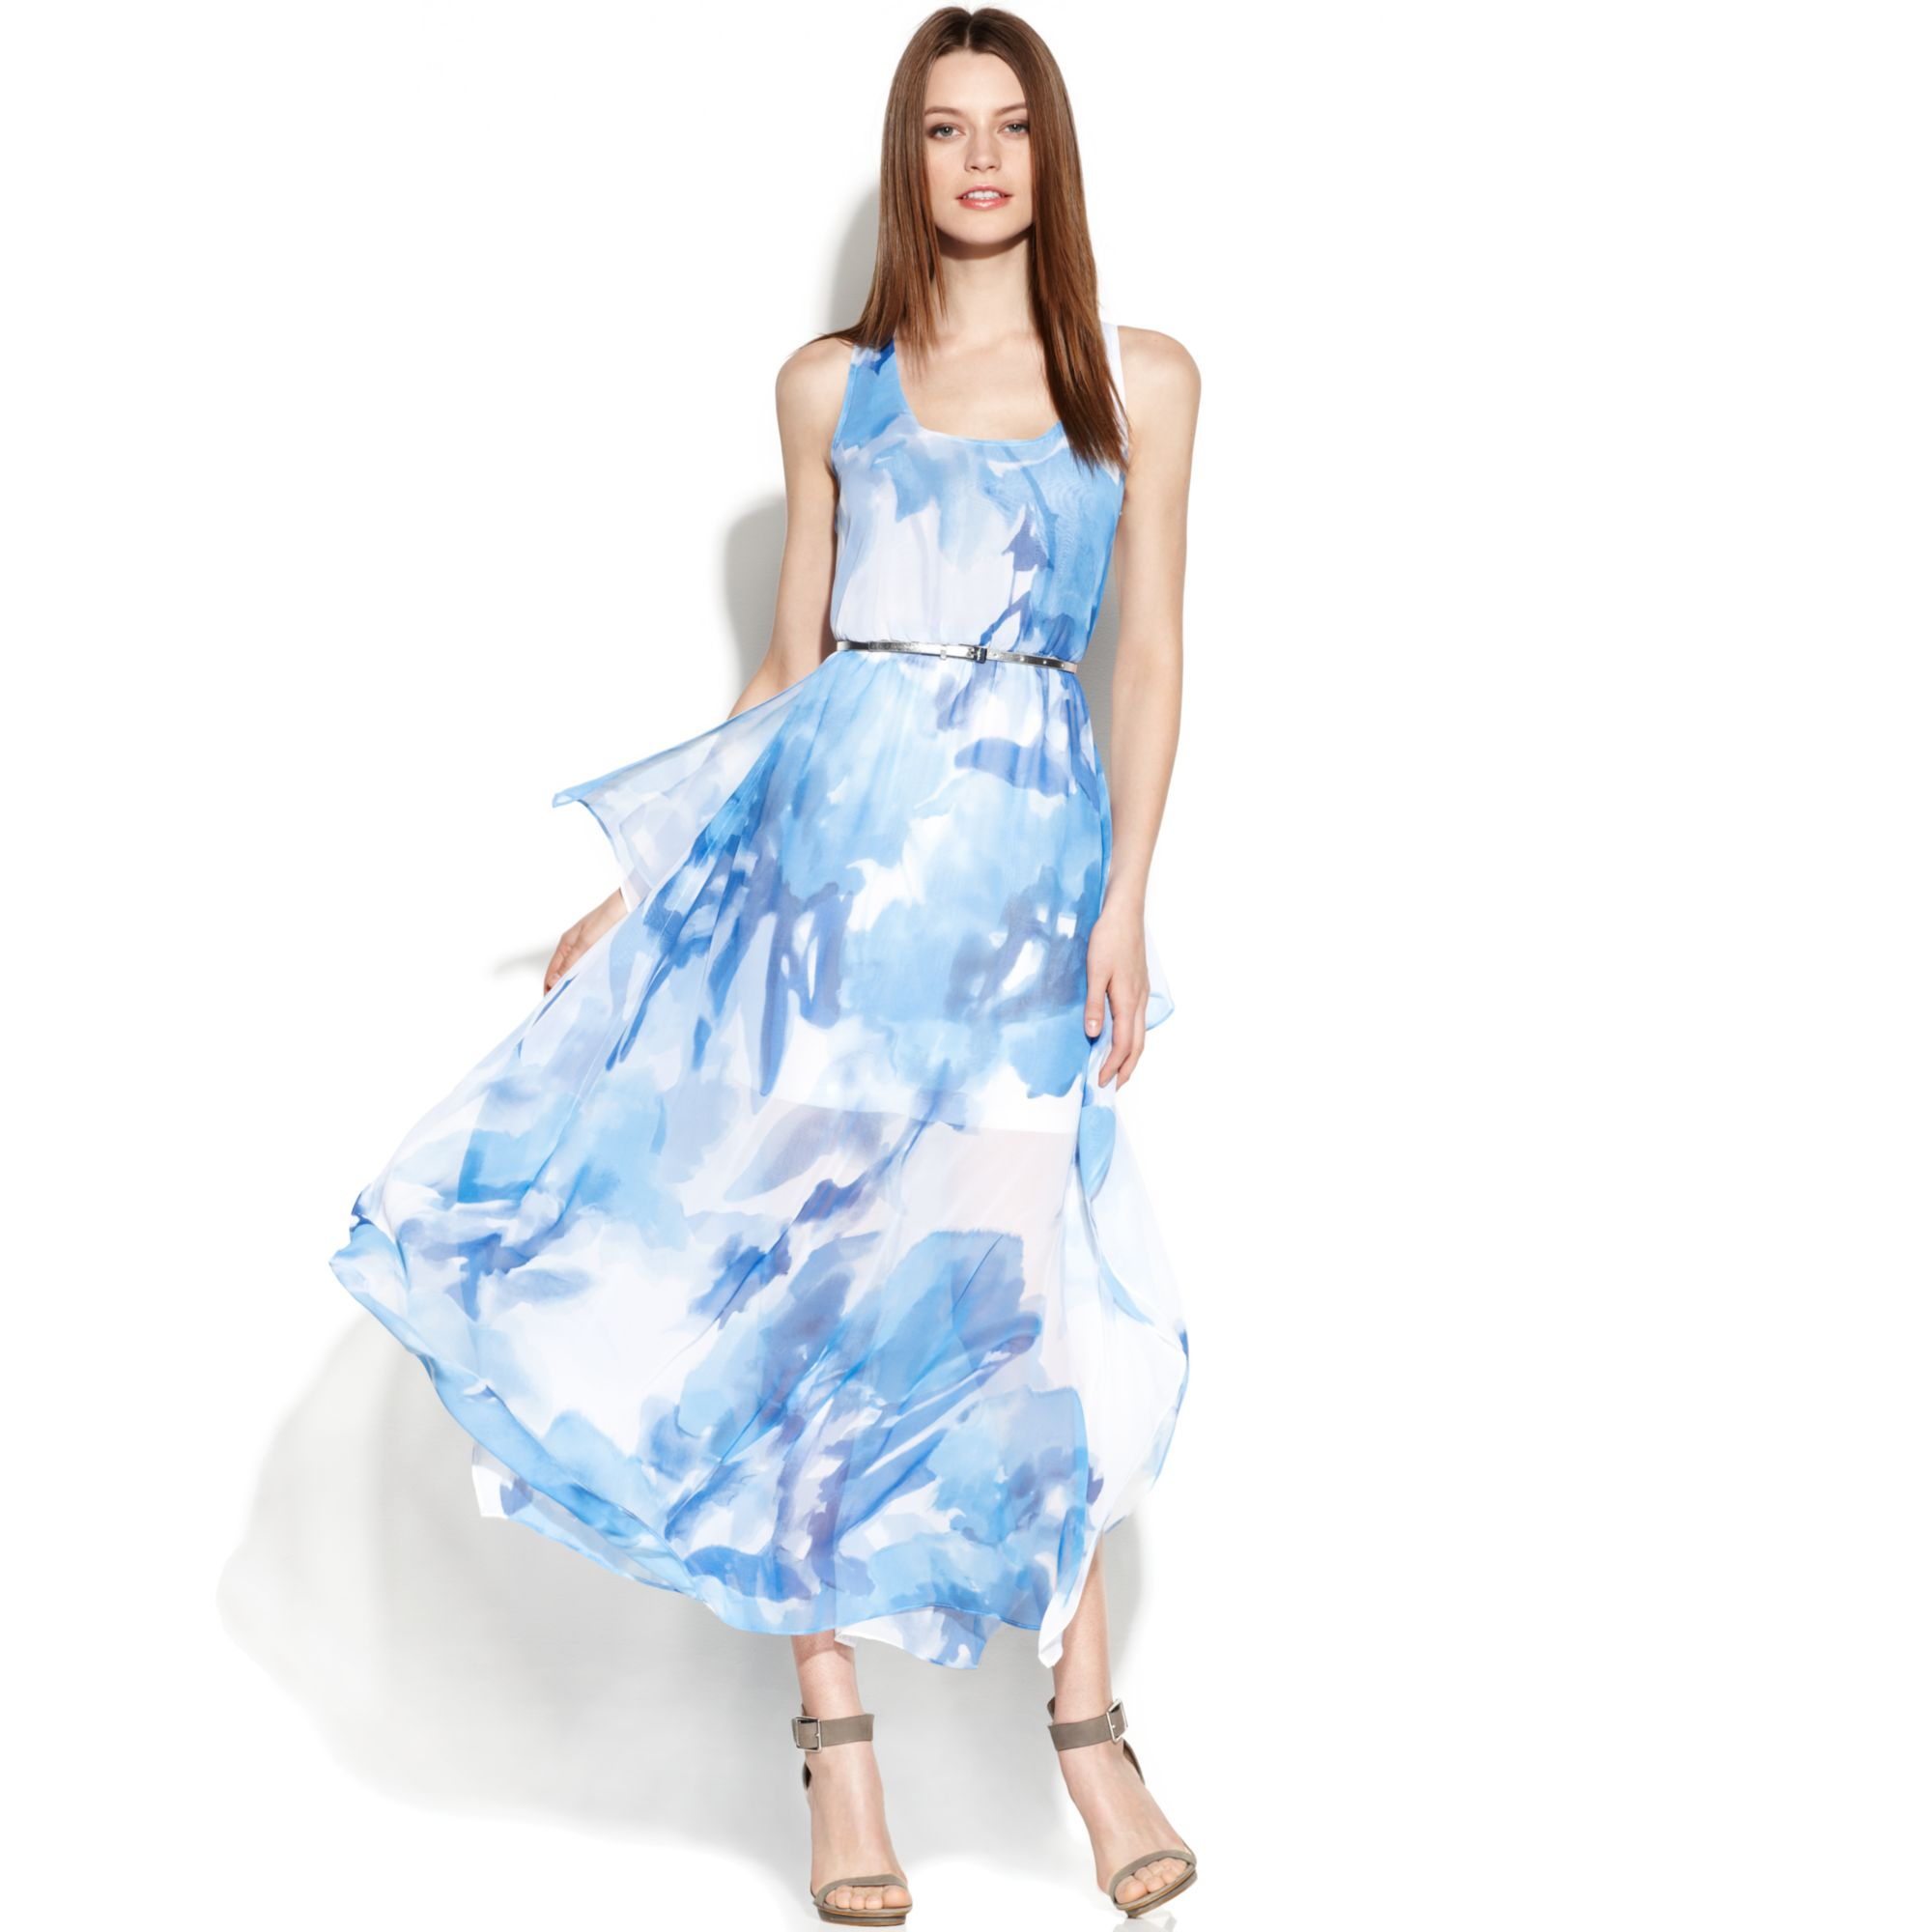 a31cd34a99159 Lyst - Calvin Klein Floralprint Chiffon Maxi Dress in Blue